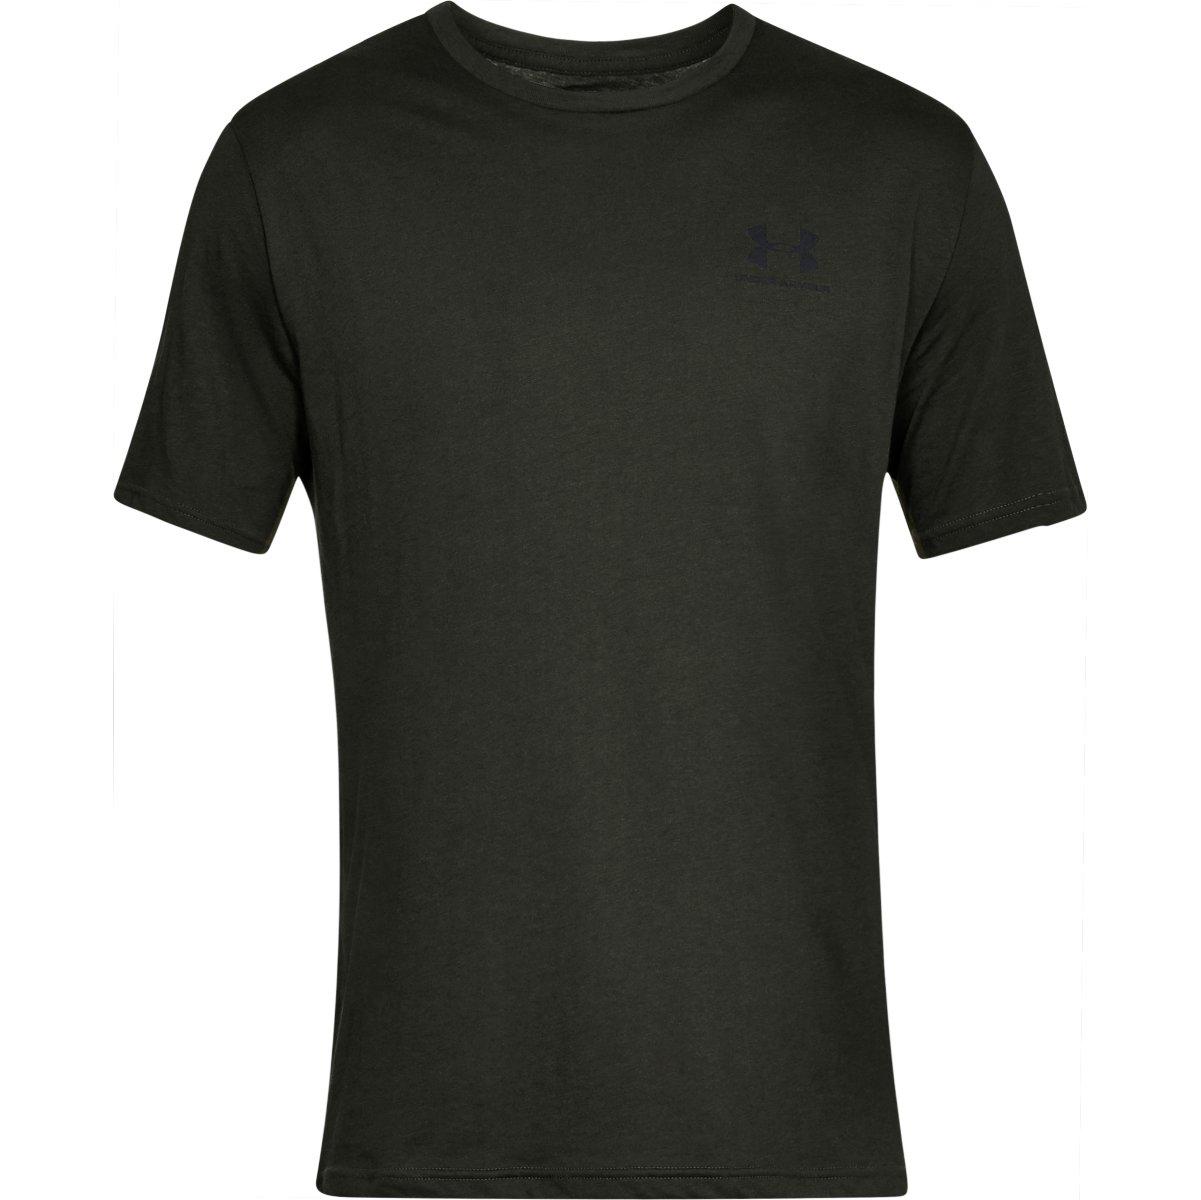 Under Armour Men's Ua Sportstyle Left Chest Short-Sleeve Tee - Green, L